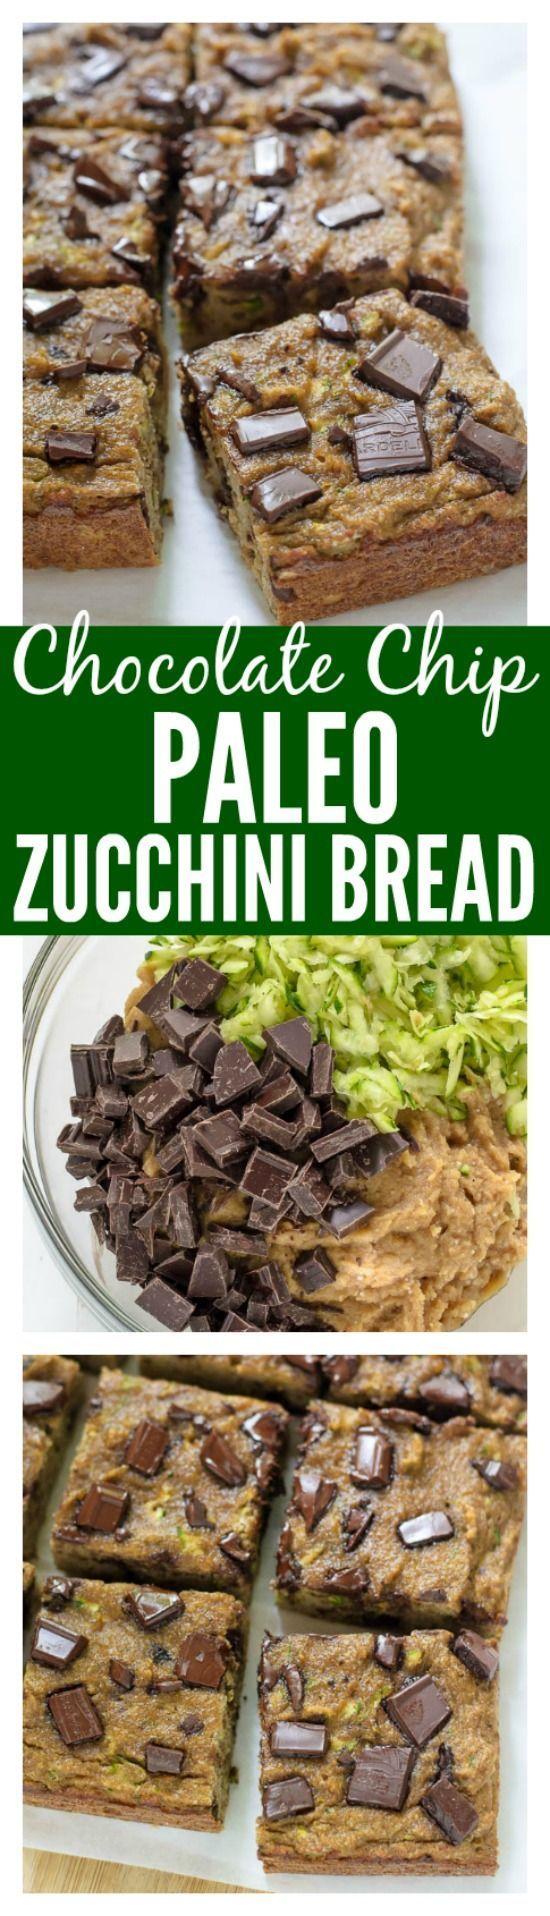 Grain free, Zucchini and Paleo on Pinterest